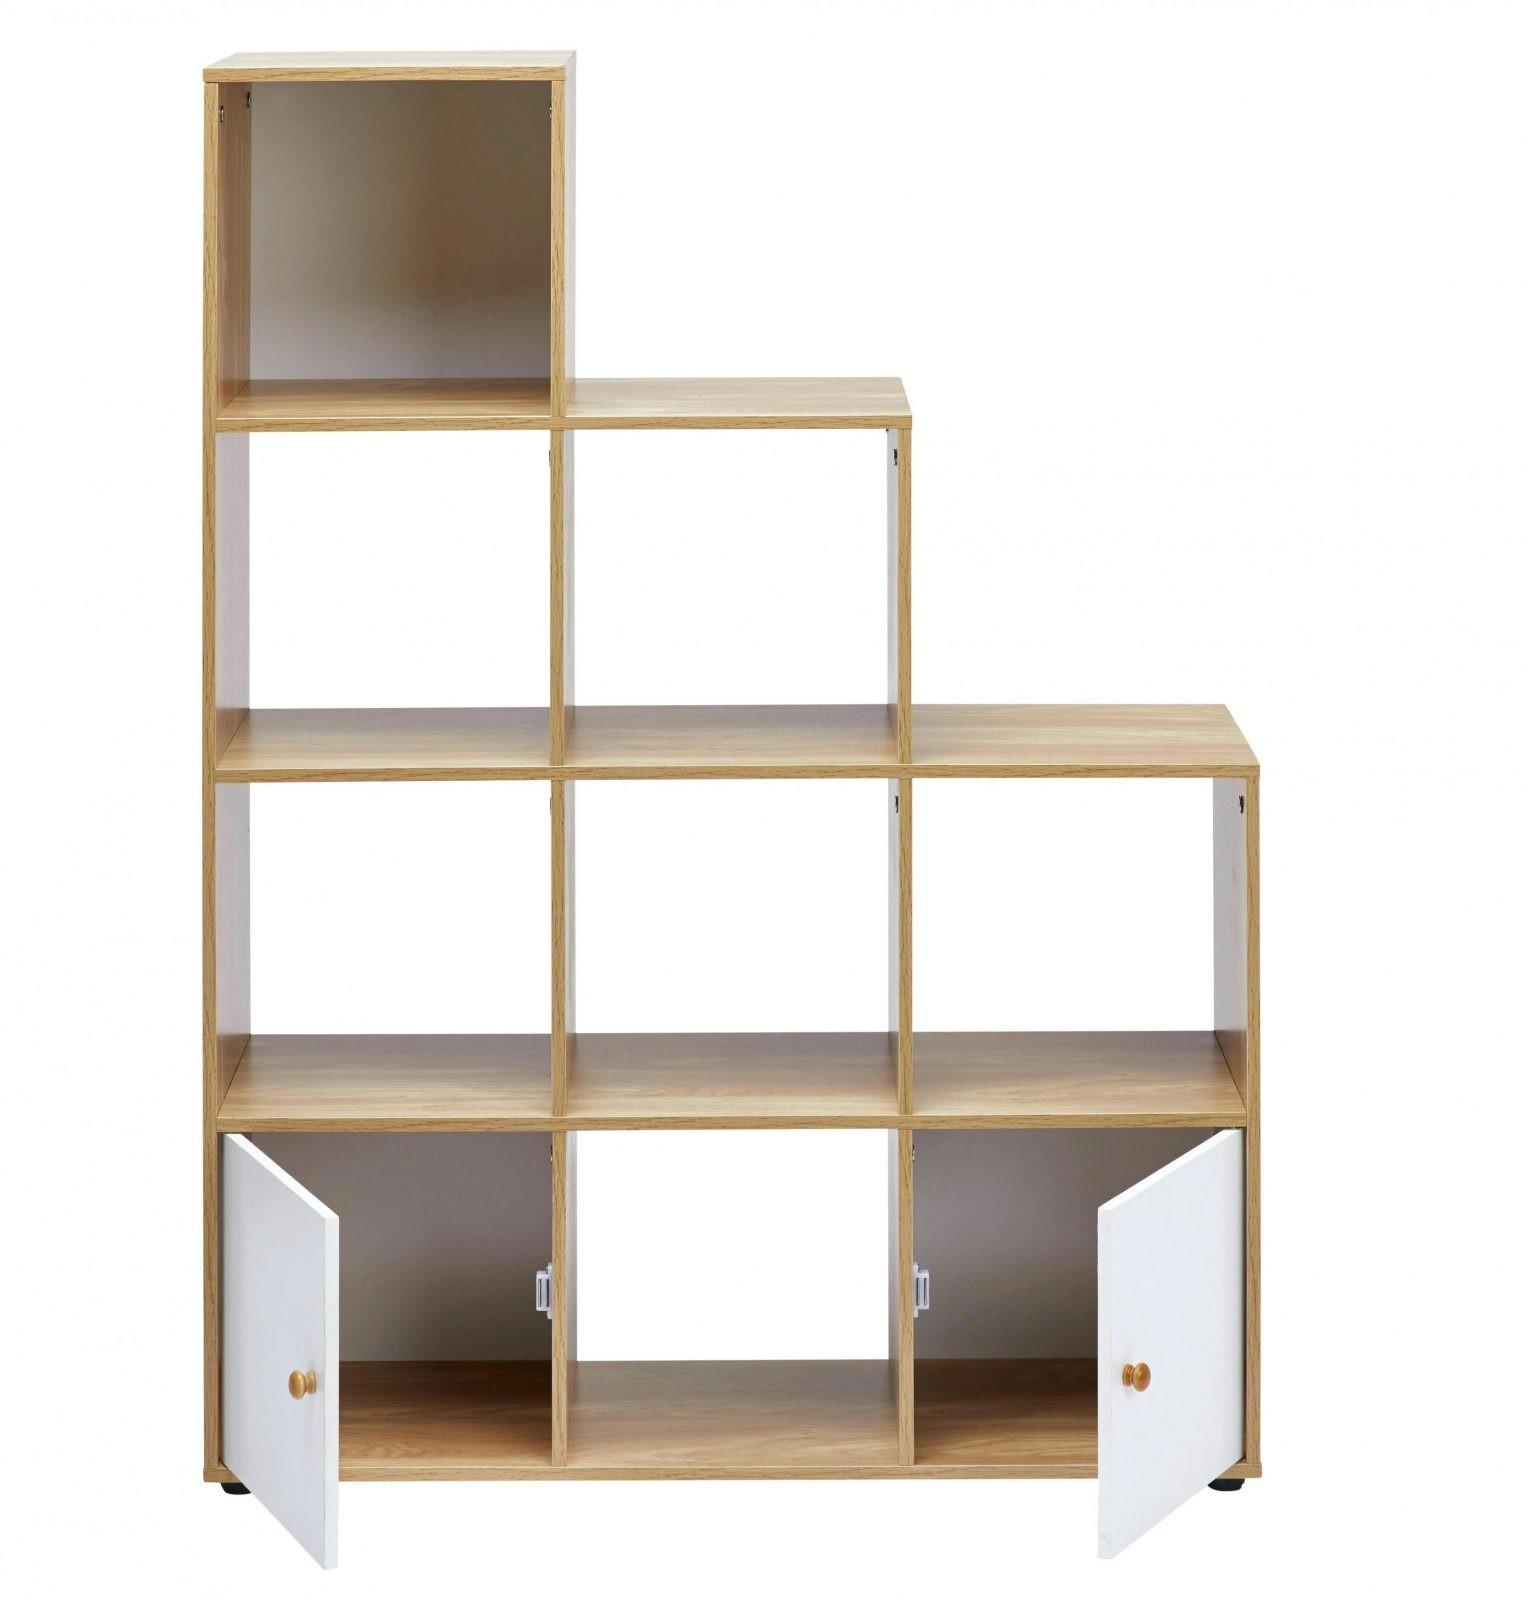 einfaches regal selber bauen beautiful wandregal with einfaches regal selber bauen trendy. Black Bedroom Furniture Sets. Home Design Ideas